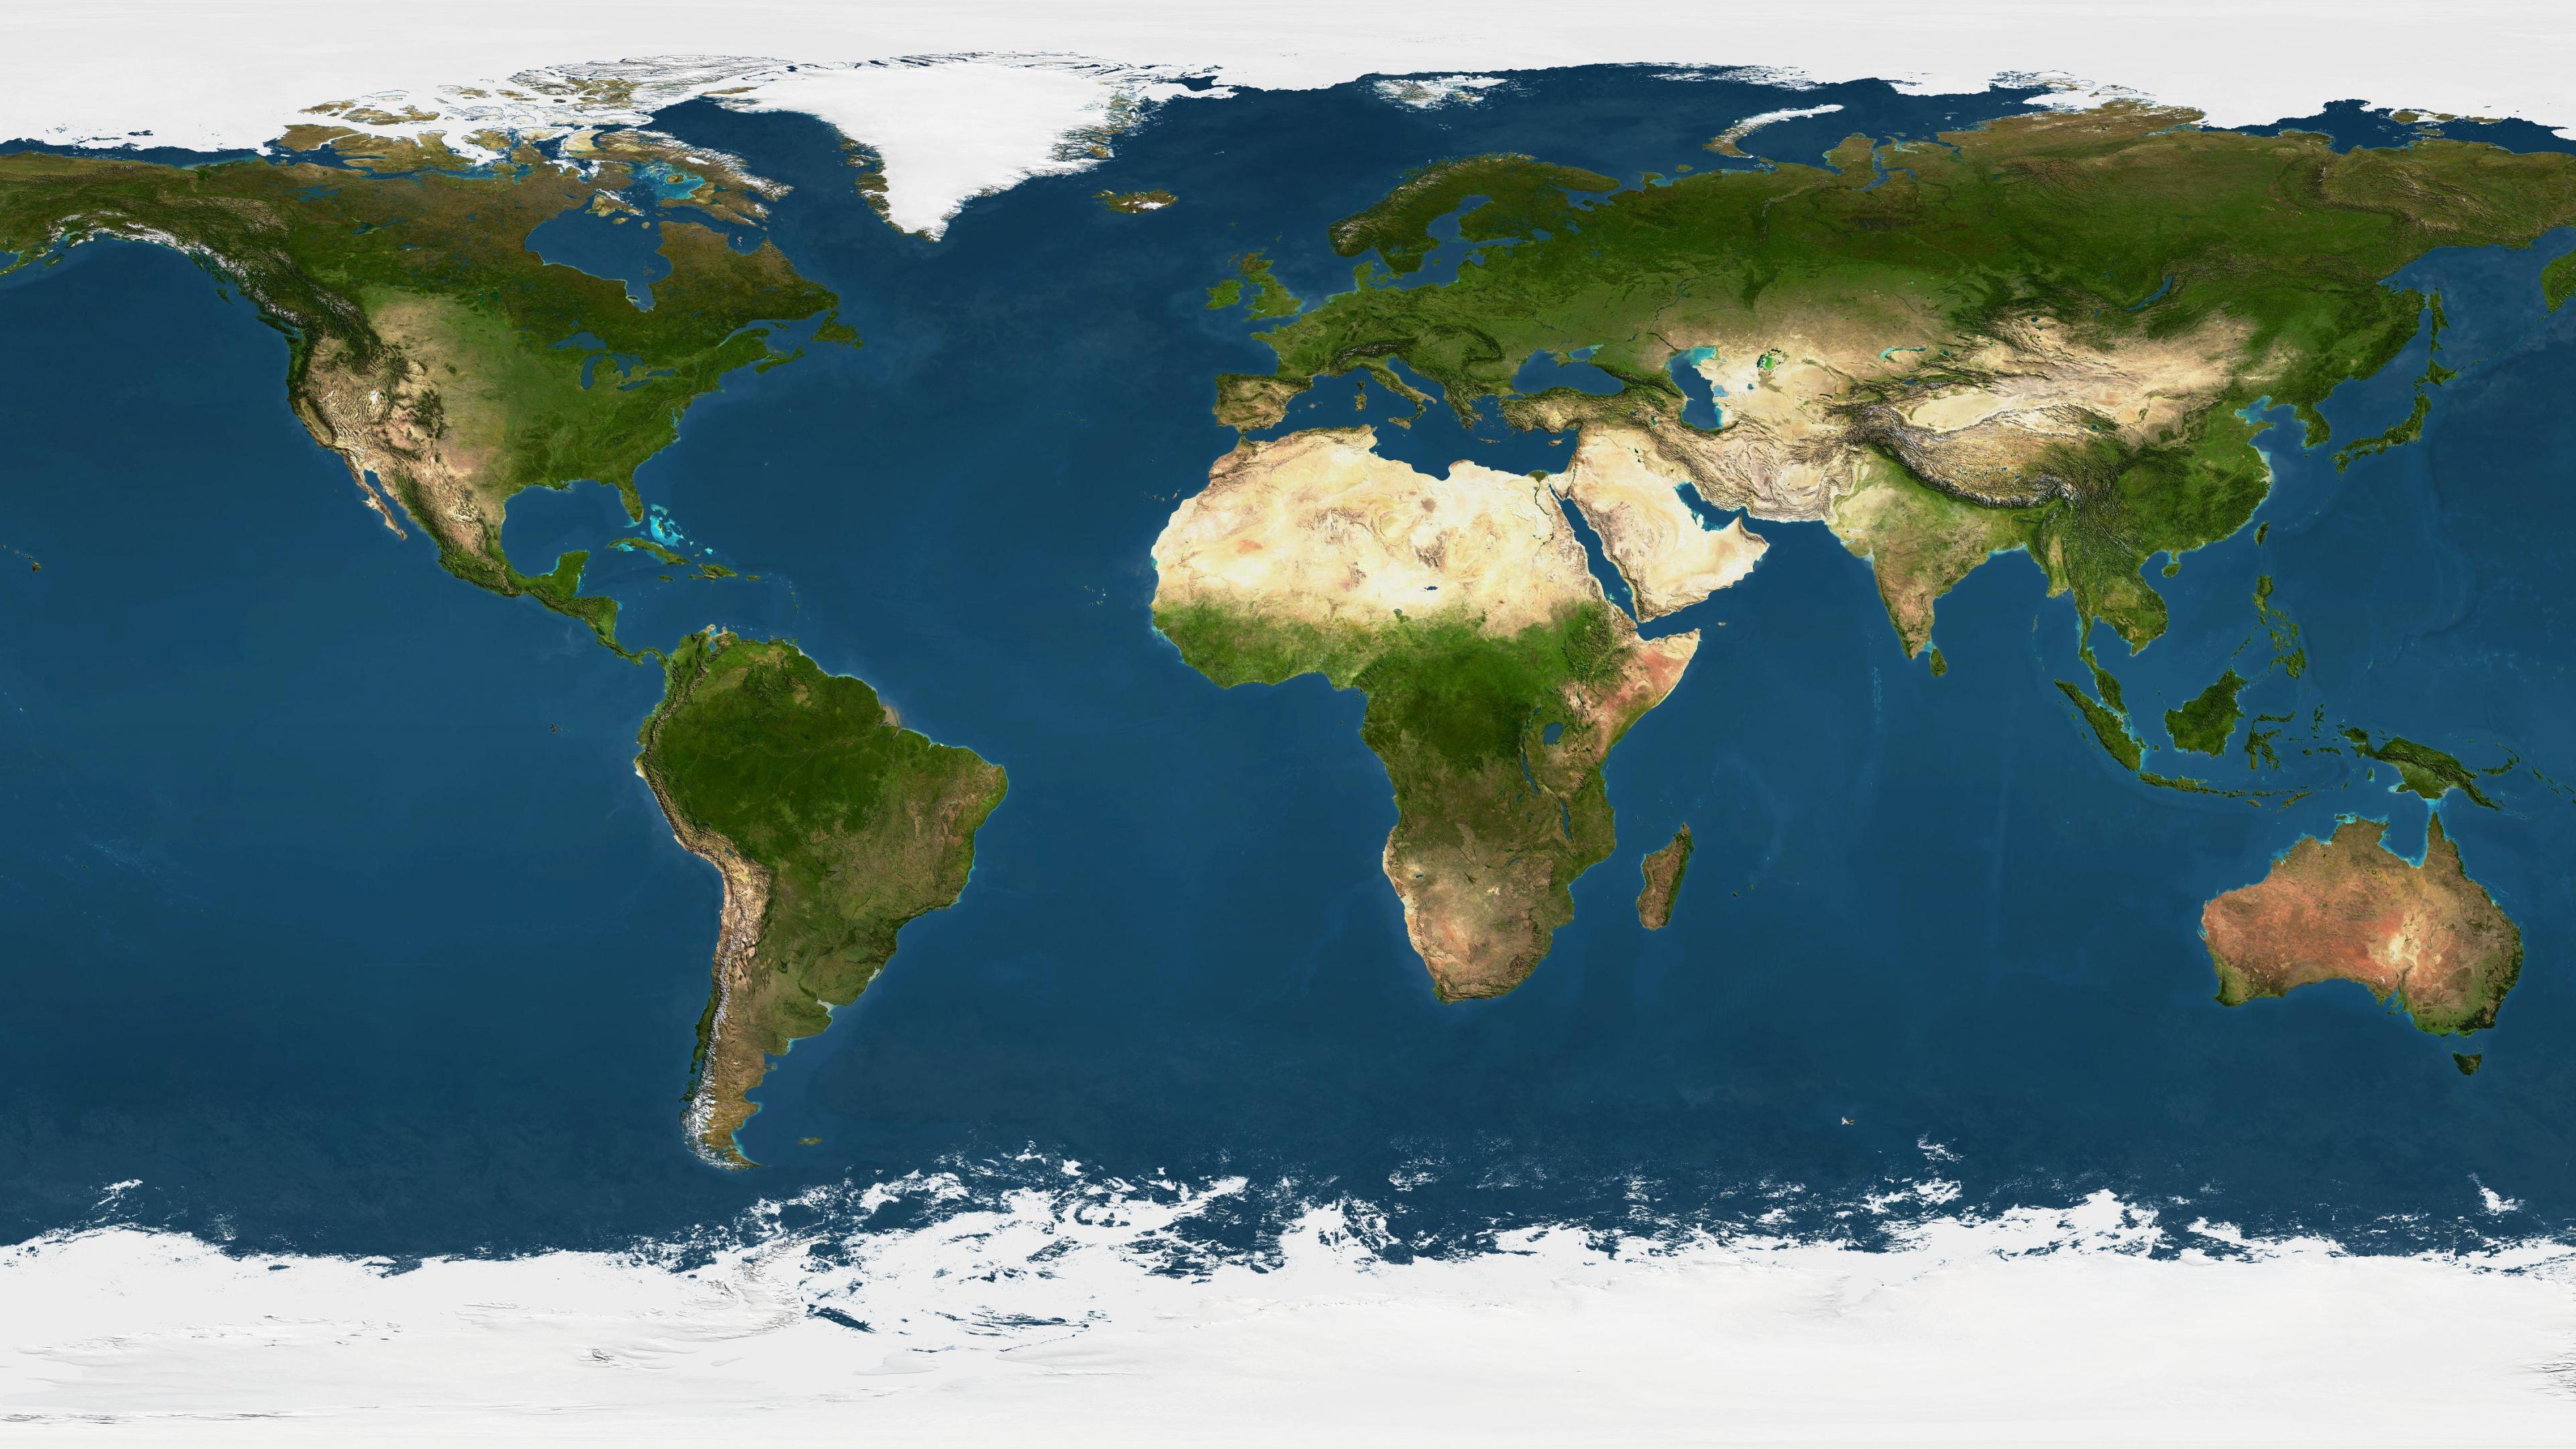 [74+] World Map Wallpaper High Resolution on WallpaperSafari